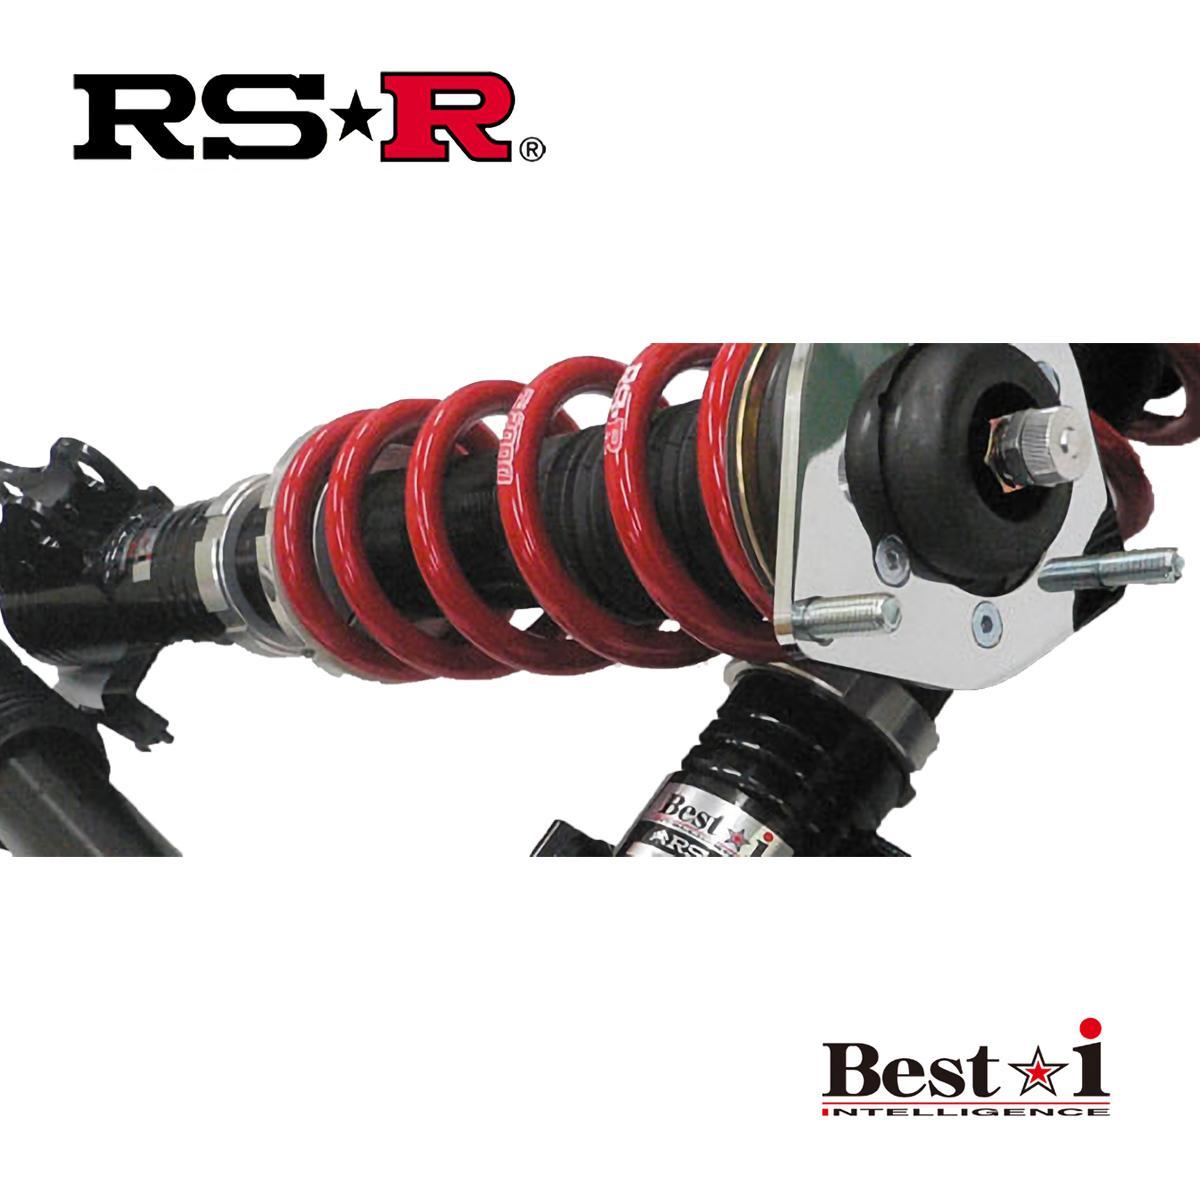 RS-R RX-7 RX7 スピリットR タイプB FD3S 車高調 リア車高調整:ネジ式/ハードバネレート仕様 BIM052H ベストi RSR 条件付き送料無料